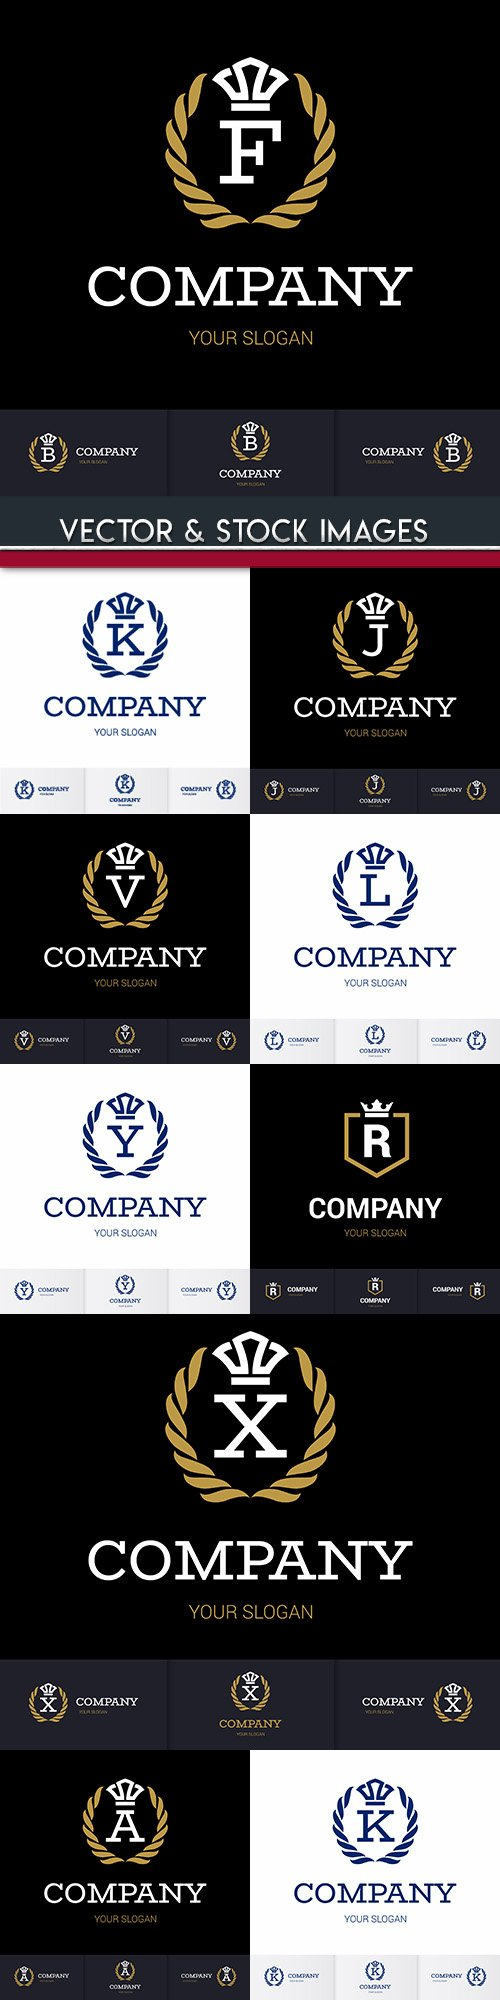 Creative logos corporate company design 30